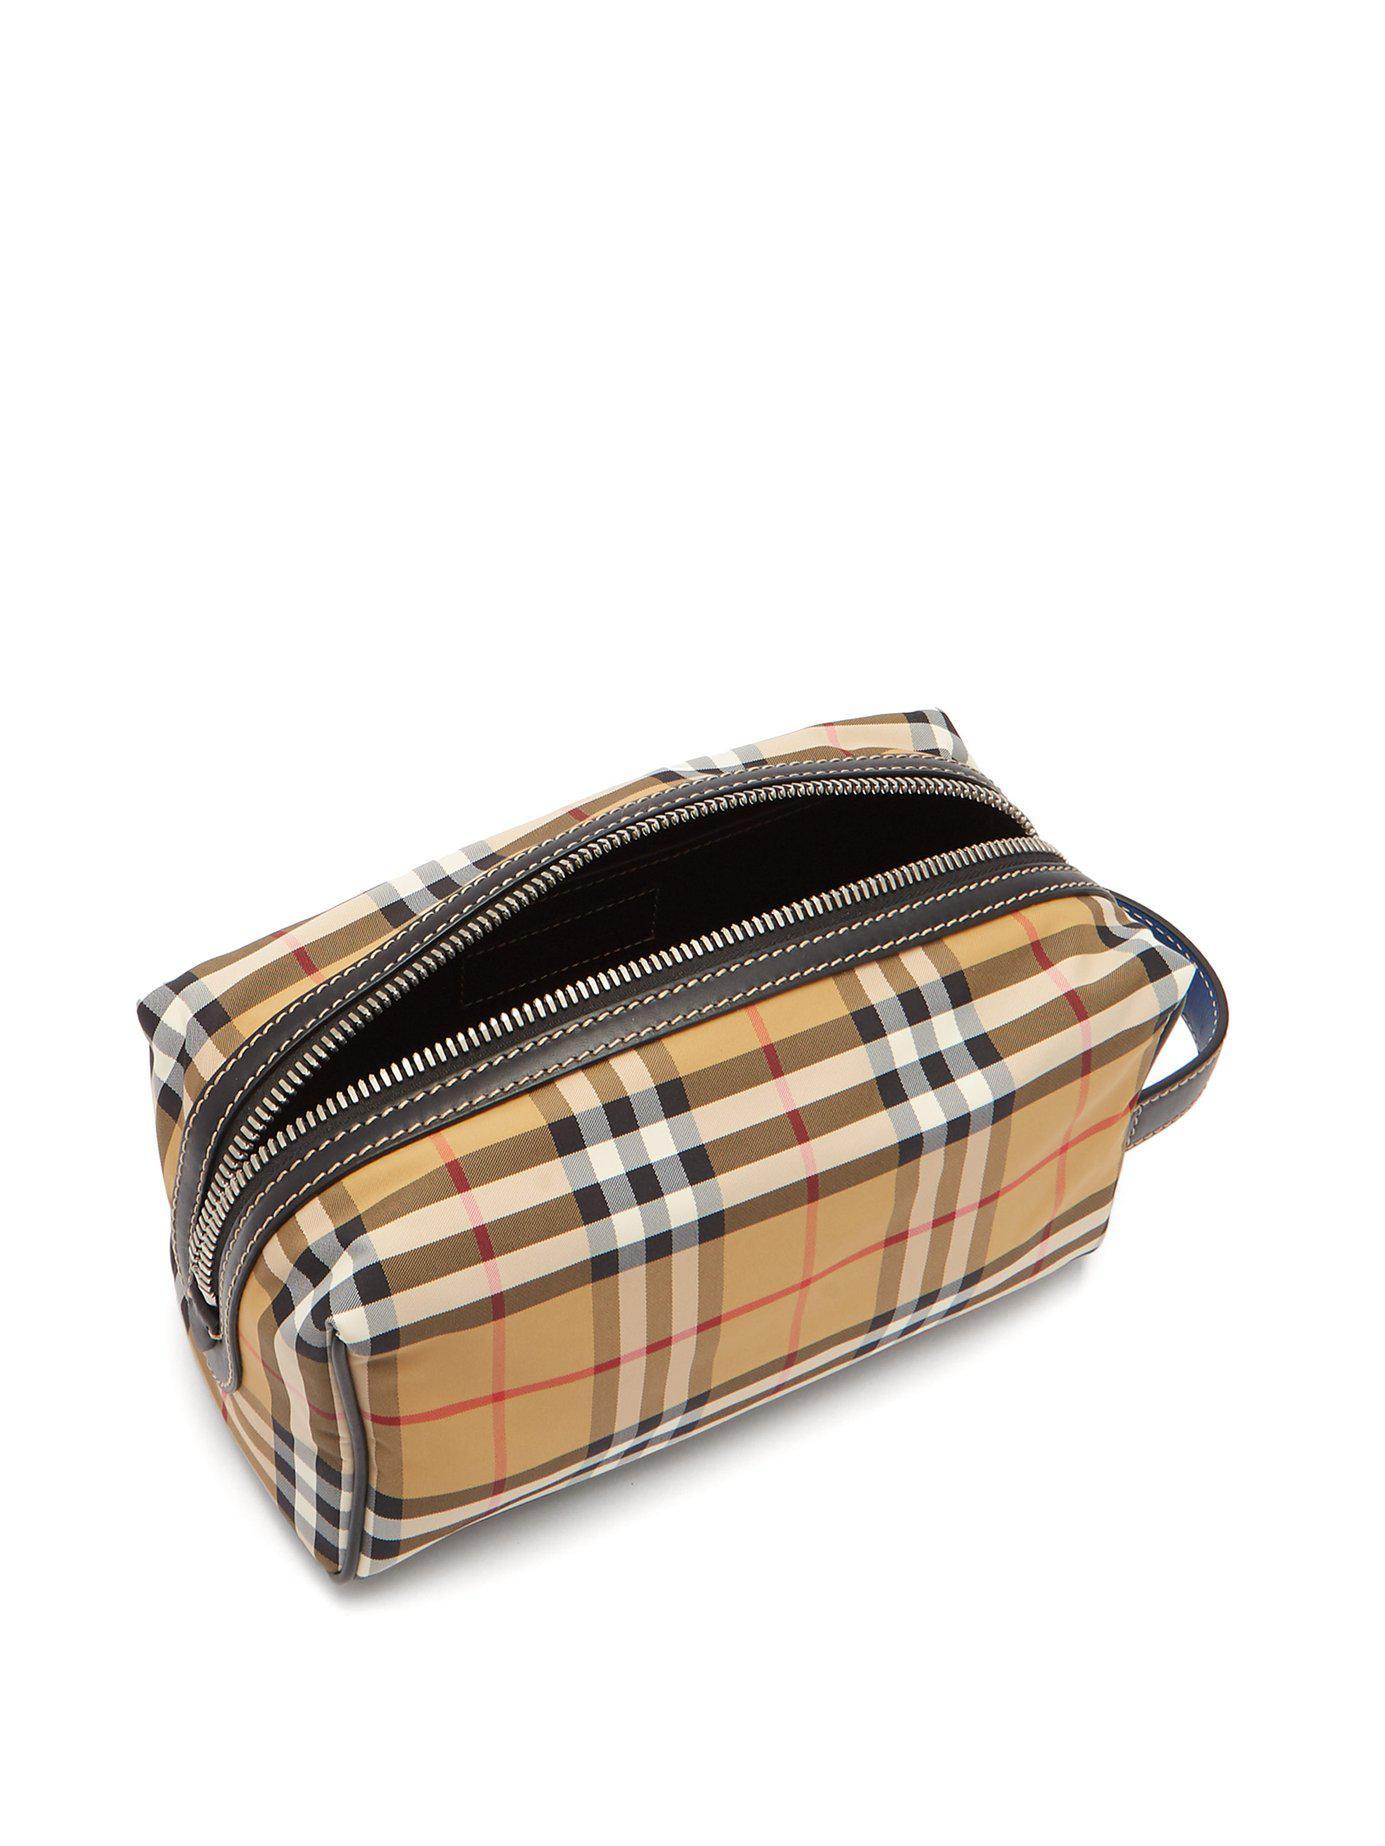 63ba58816b5 Burberry - Brown Vintage Check Nylon Wash Bag for Men - Lyst. View  fullscreen